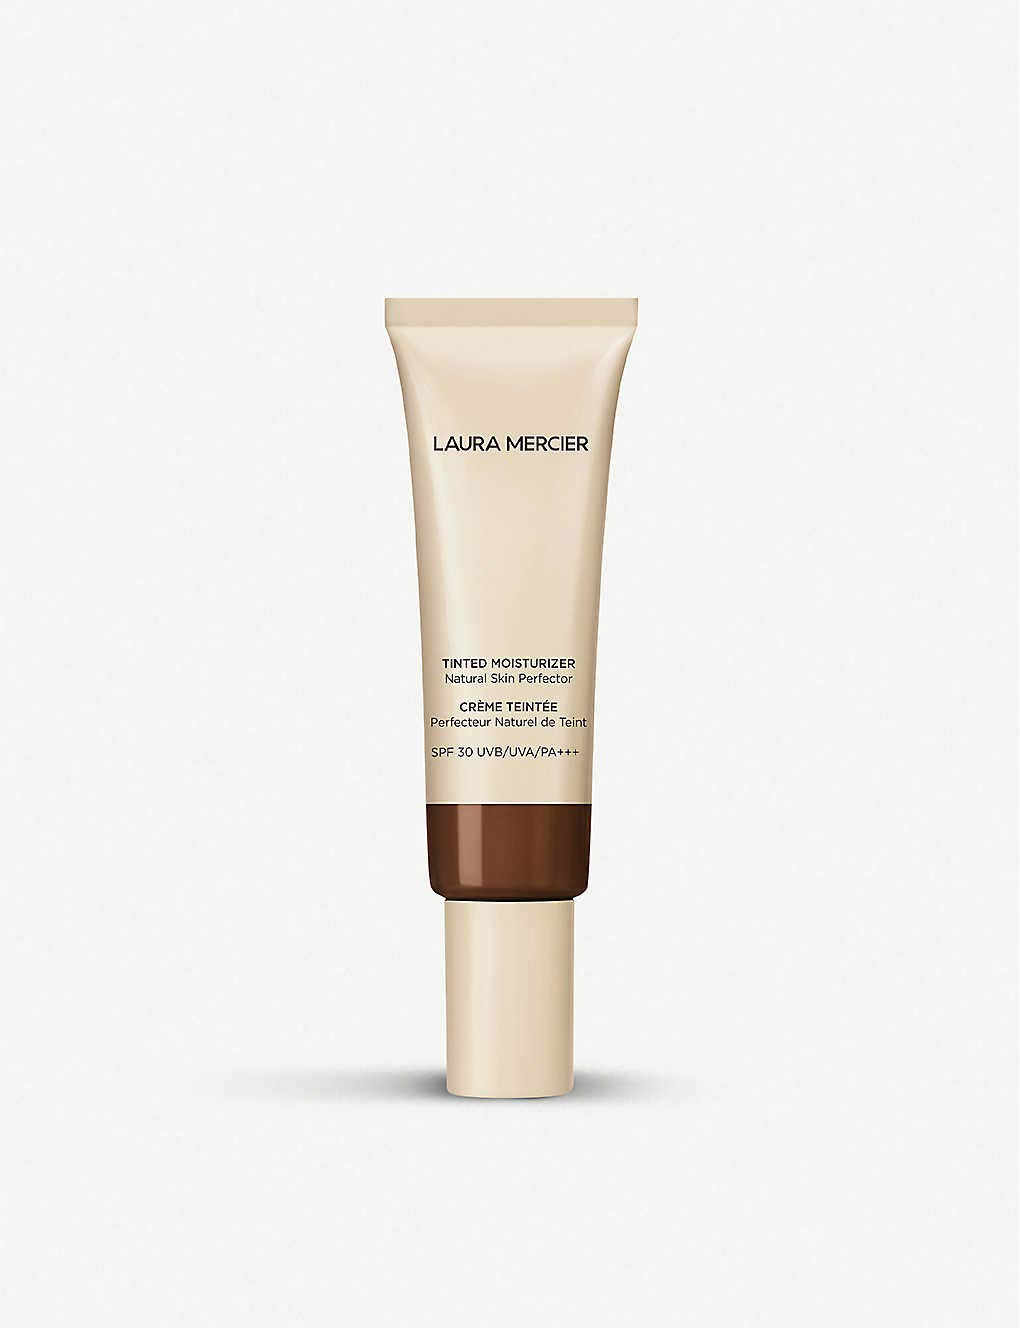 Laura Mercier Tinted Moisturizer Natural Skin Perfector SPF 30, #6C1, 1.7 oz